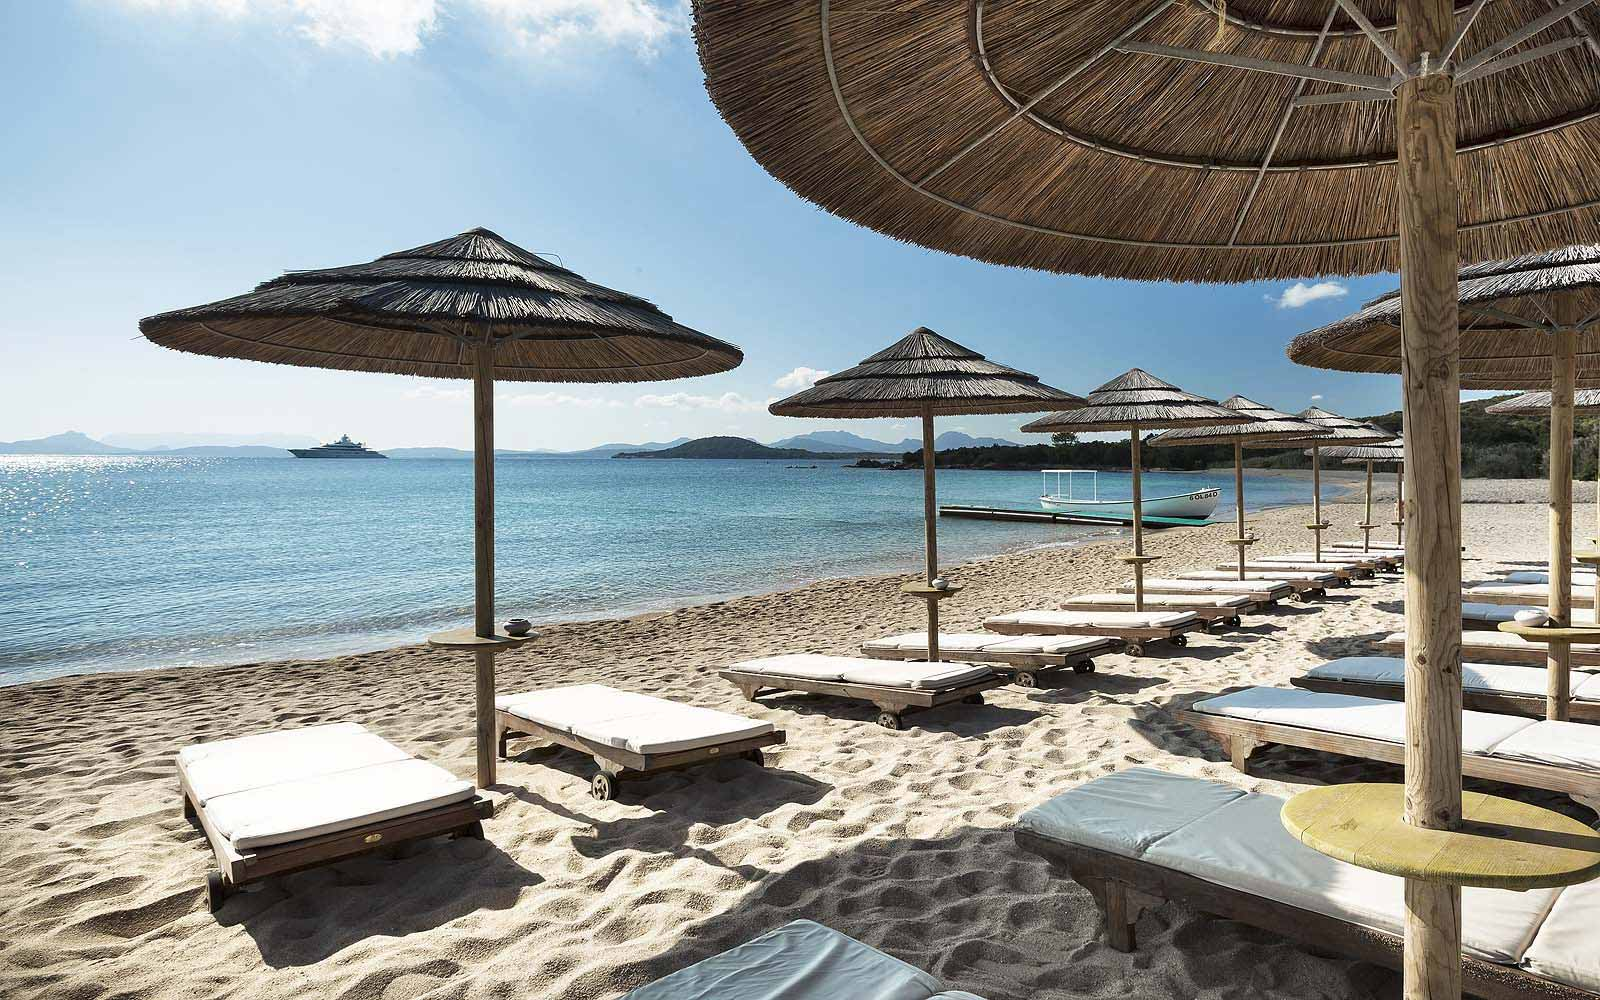 Beach at the Hotel Cala di Volpe